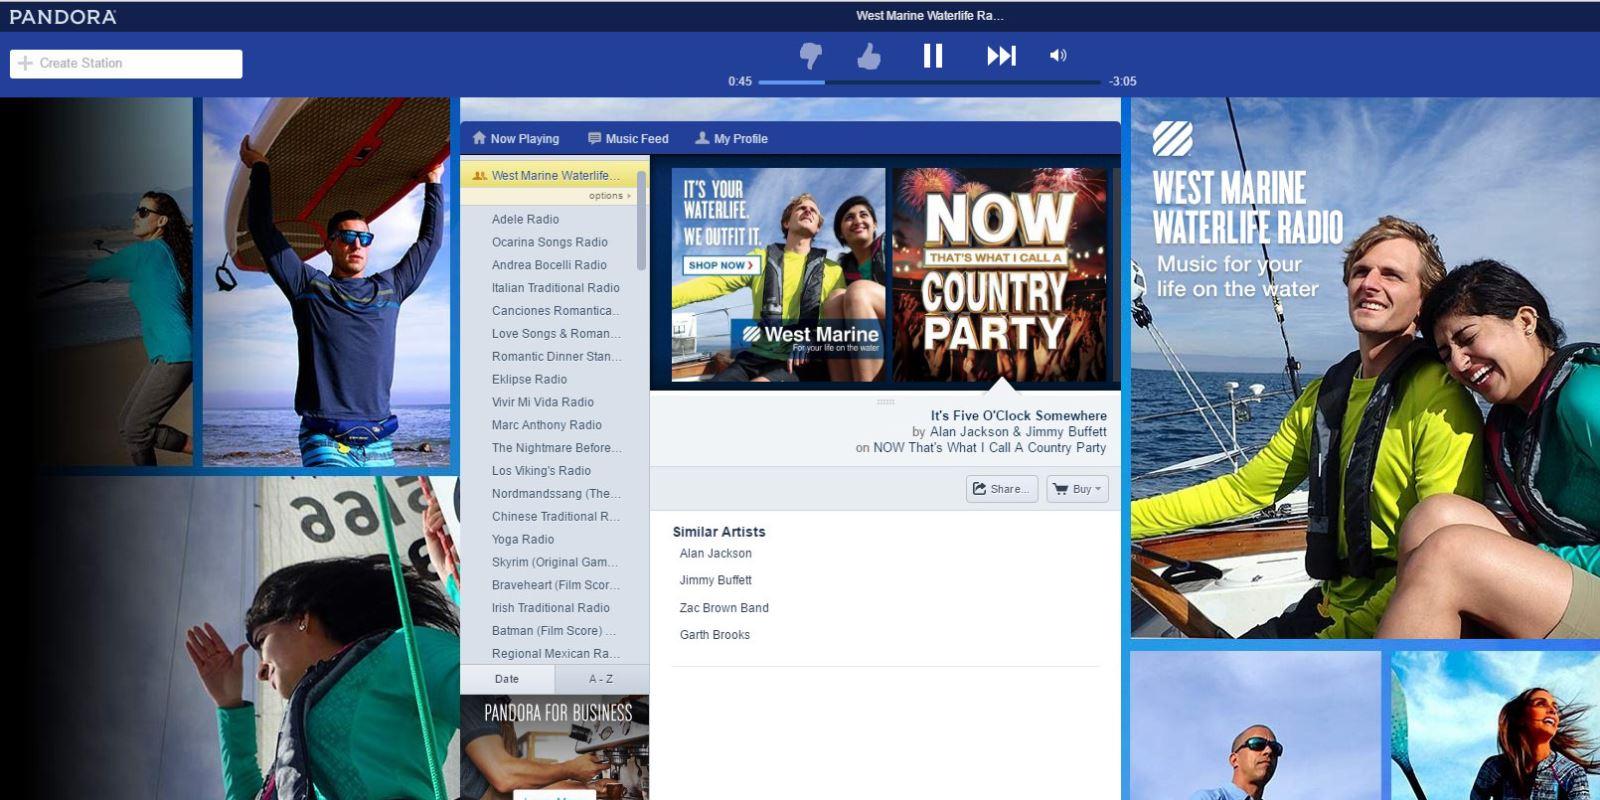 West Marine Launches Waterlife Station on Pandora Radio | Pontoon